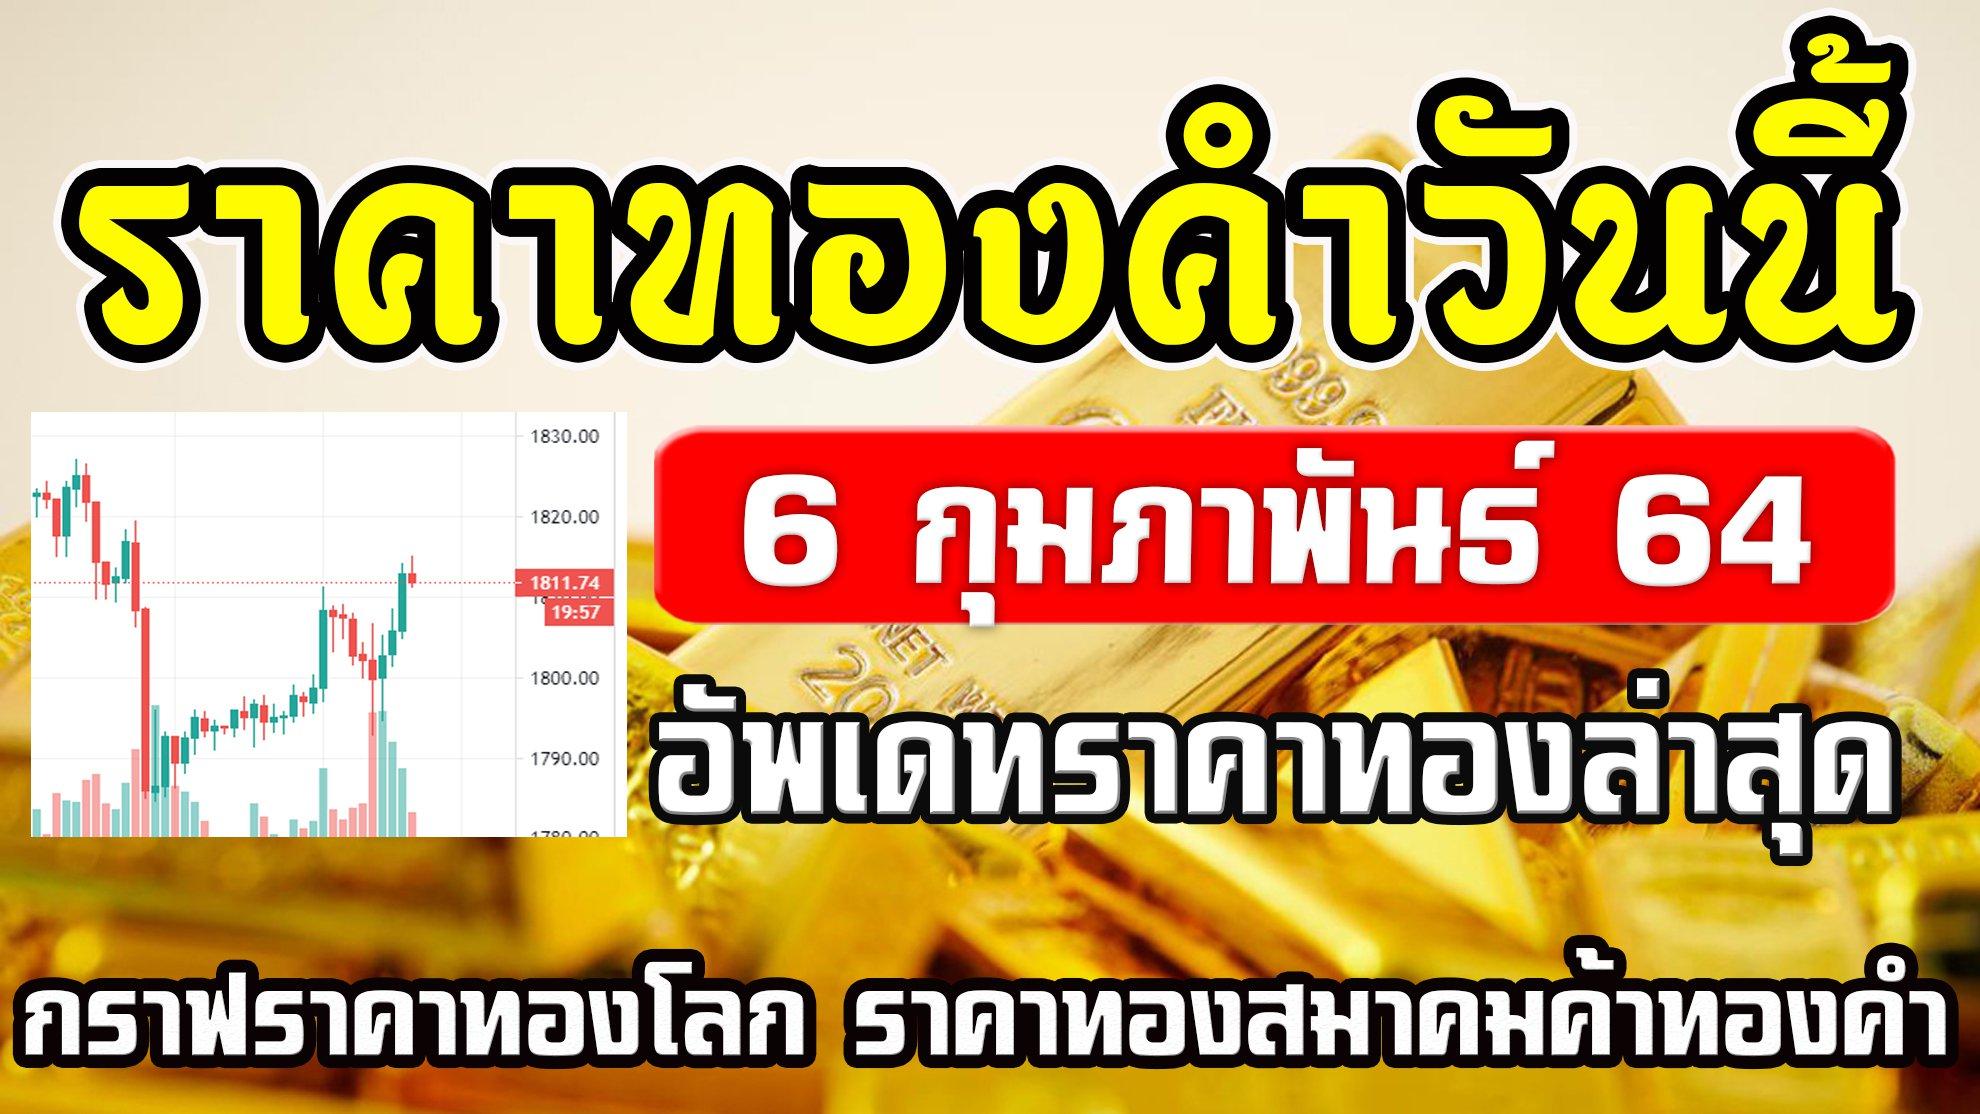 Live ราคาทองวันนี้ 6/2/64 ราคาทองคำวันนี้ 6กุมภาพันธ์64 อัพเดทราคาทองล่าสุด กราฟราคาทองโลก Gold Spot